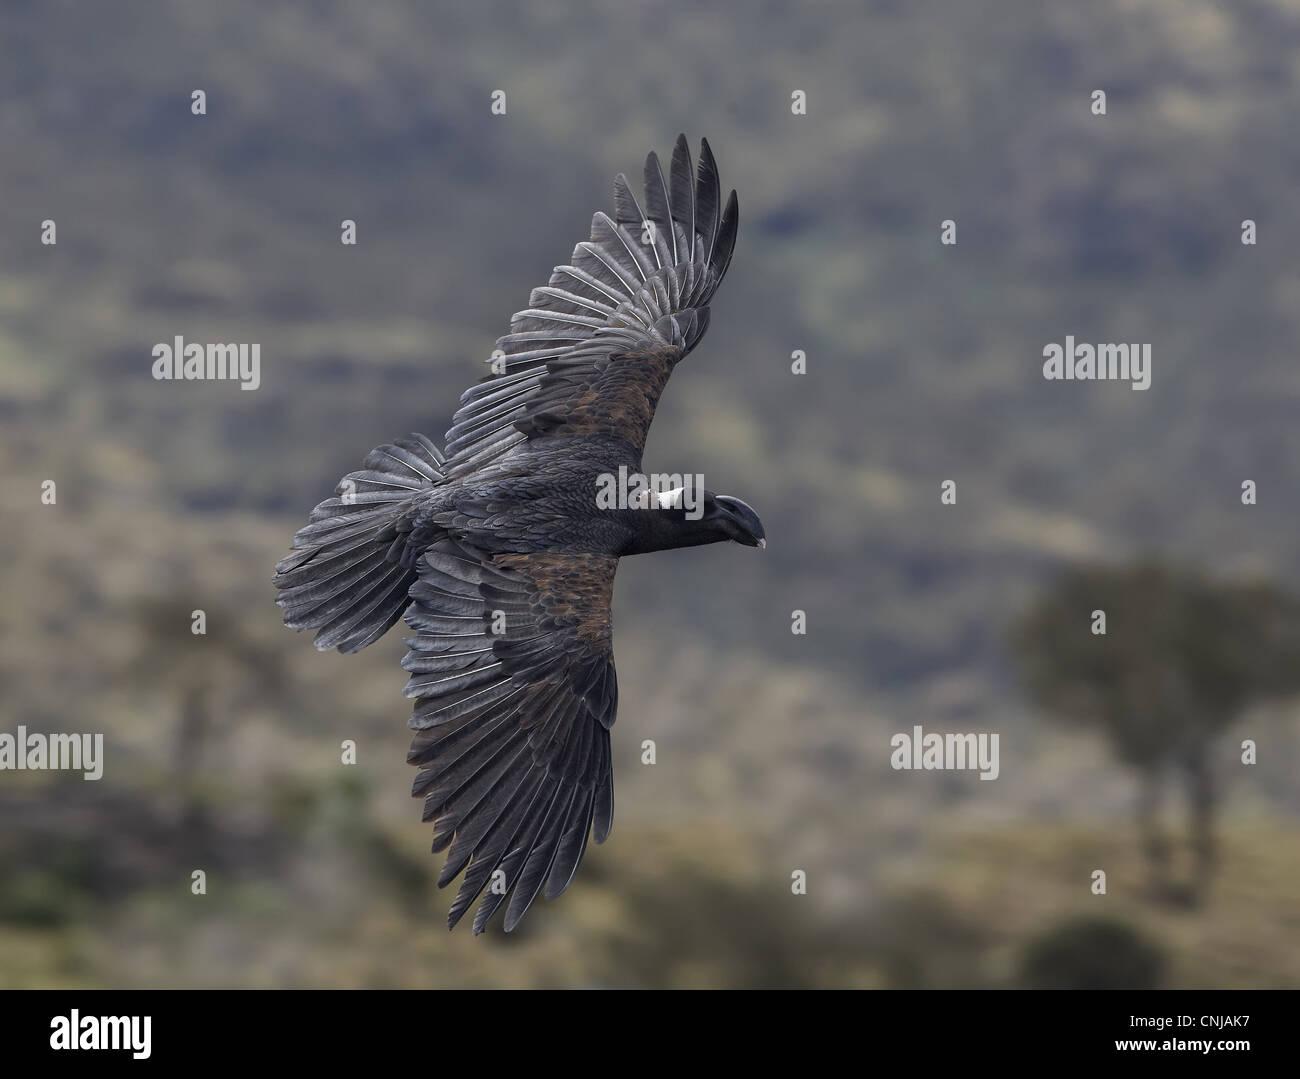 Thick-billed Raven (Corvus crassirostris) adult, in flight, Simien Mountains, Ethiopia - Stock Image